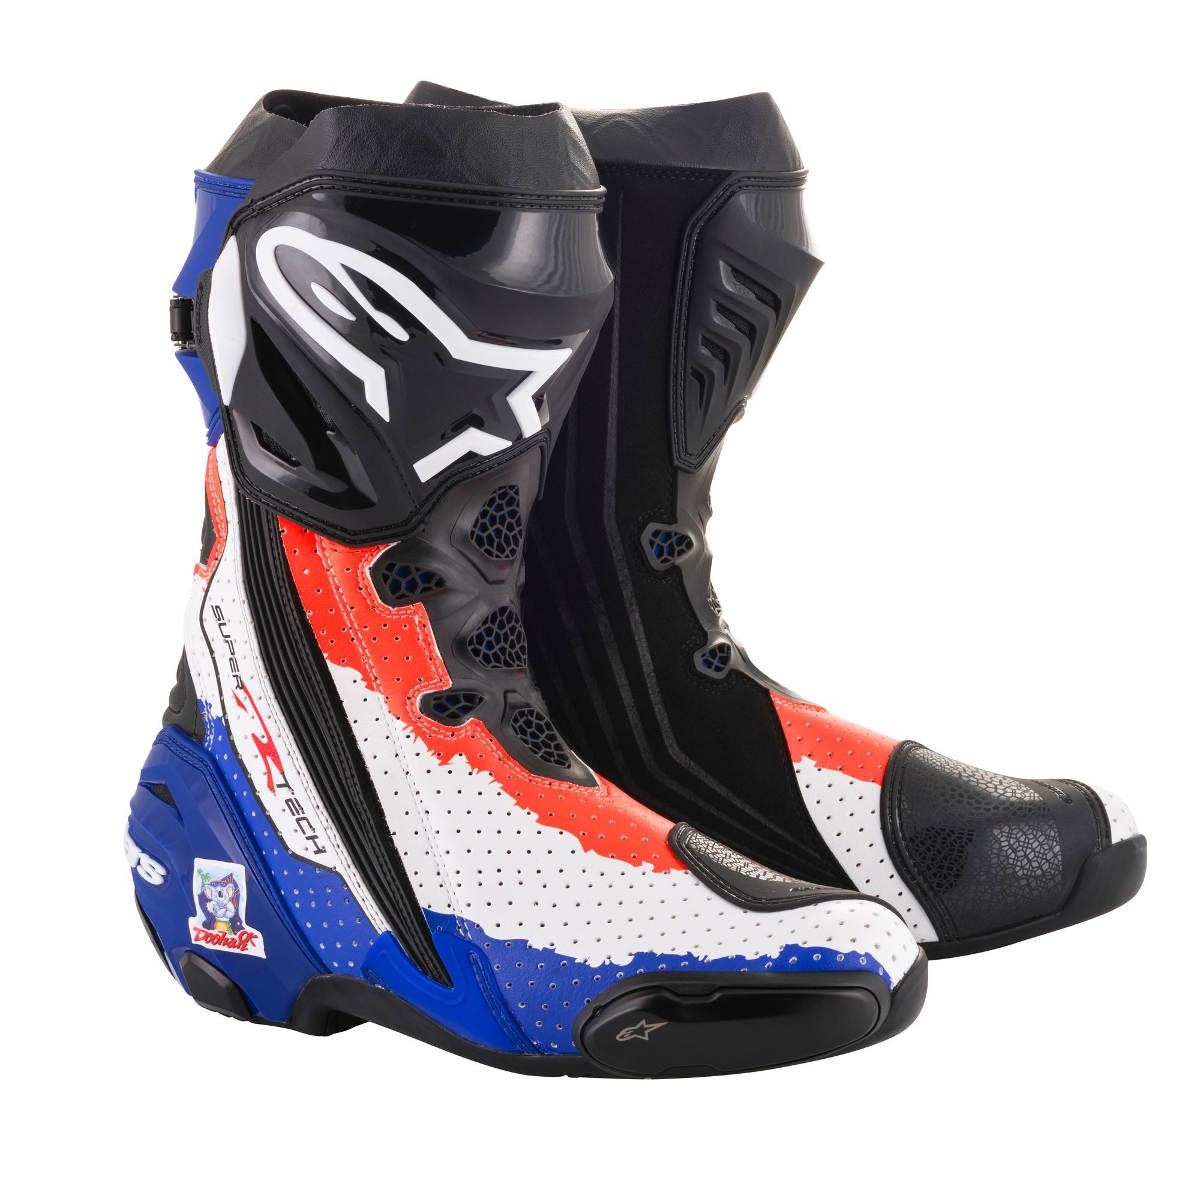 2018 Limited Edition Mick Doohan Alpinestars Supertech R Race Replica Boots